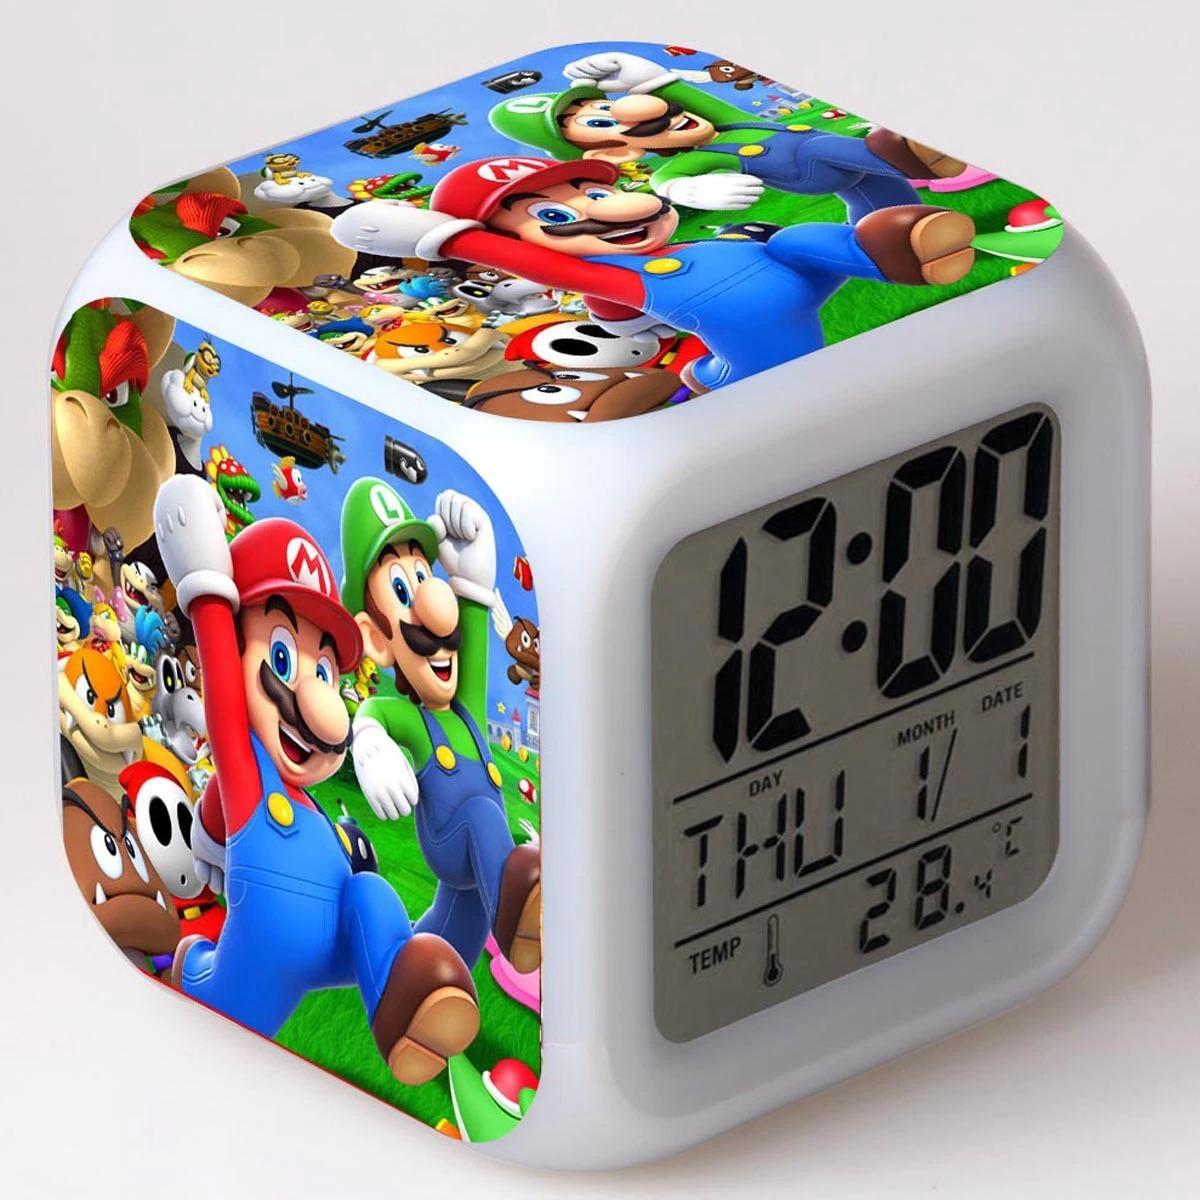 Kids Alarm Clock LED Light Color Change Super Mario Bros Digital clock - Alarm Clocks & Clock Radios